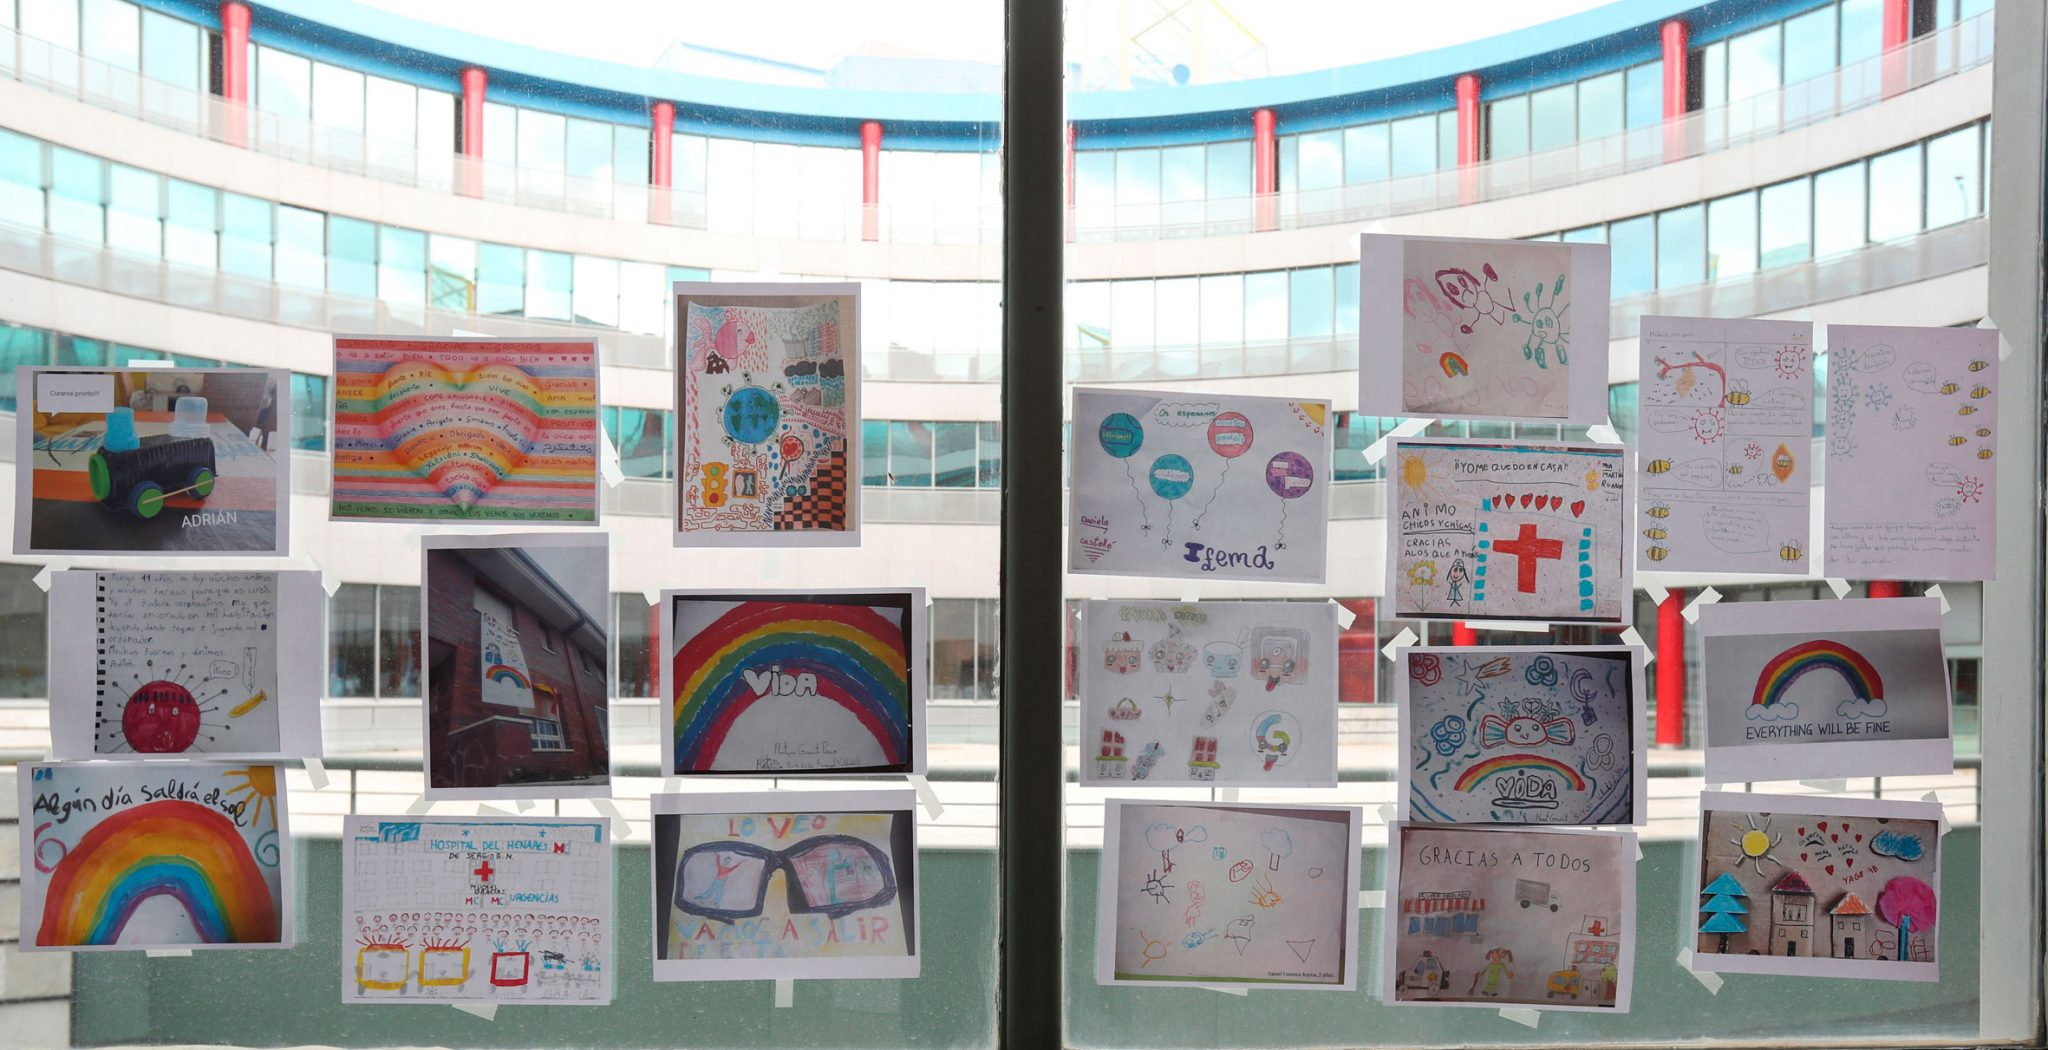 Dibujos en el hospital de IFEMA